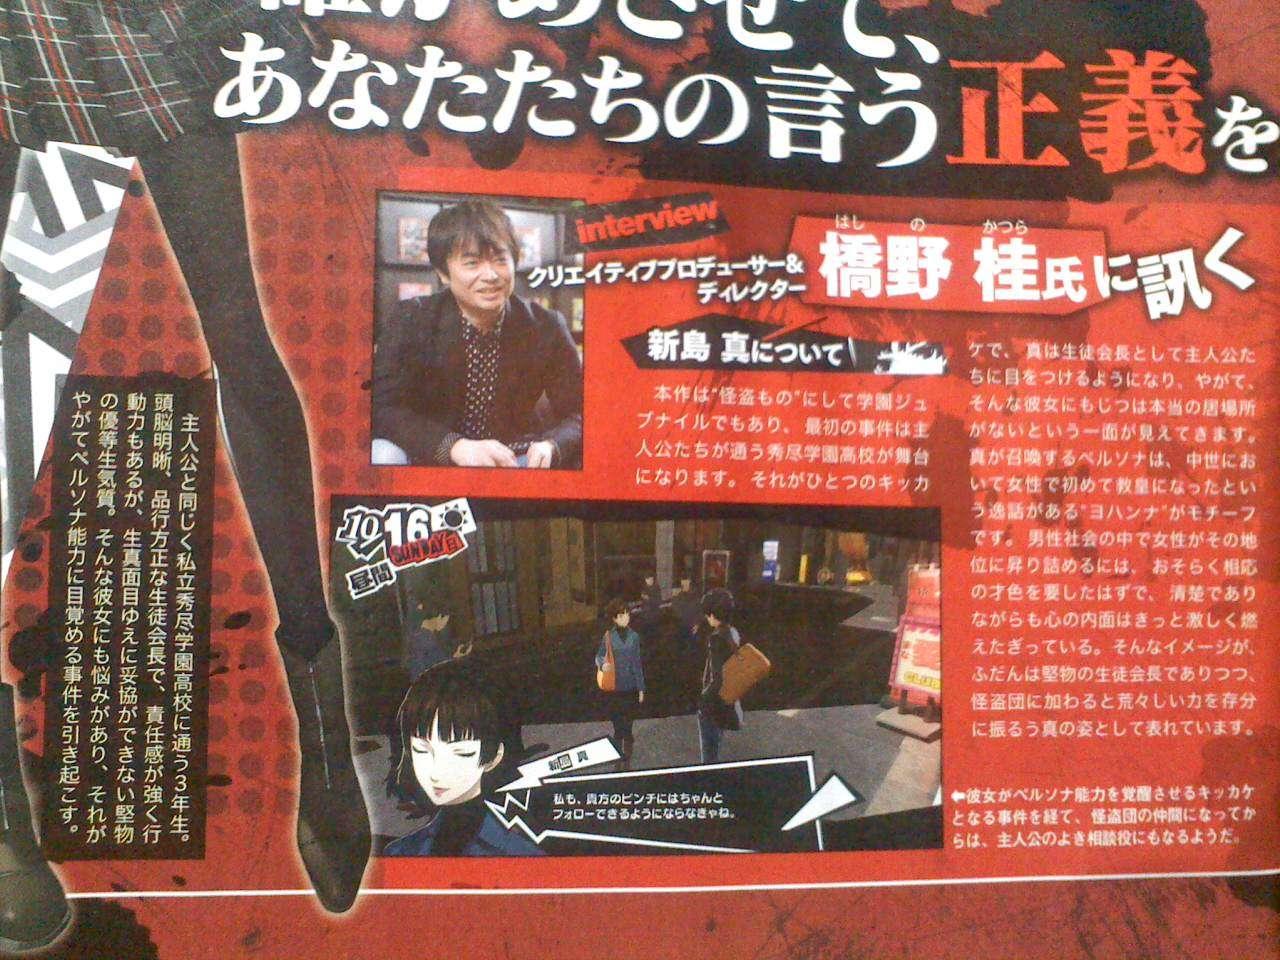 Persona-5-Famitsu-Scan-5.jpg